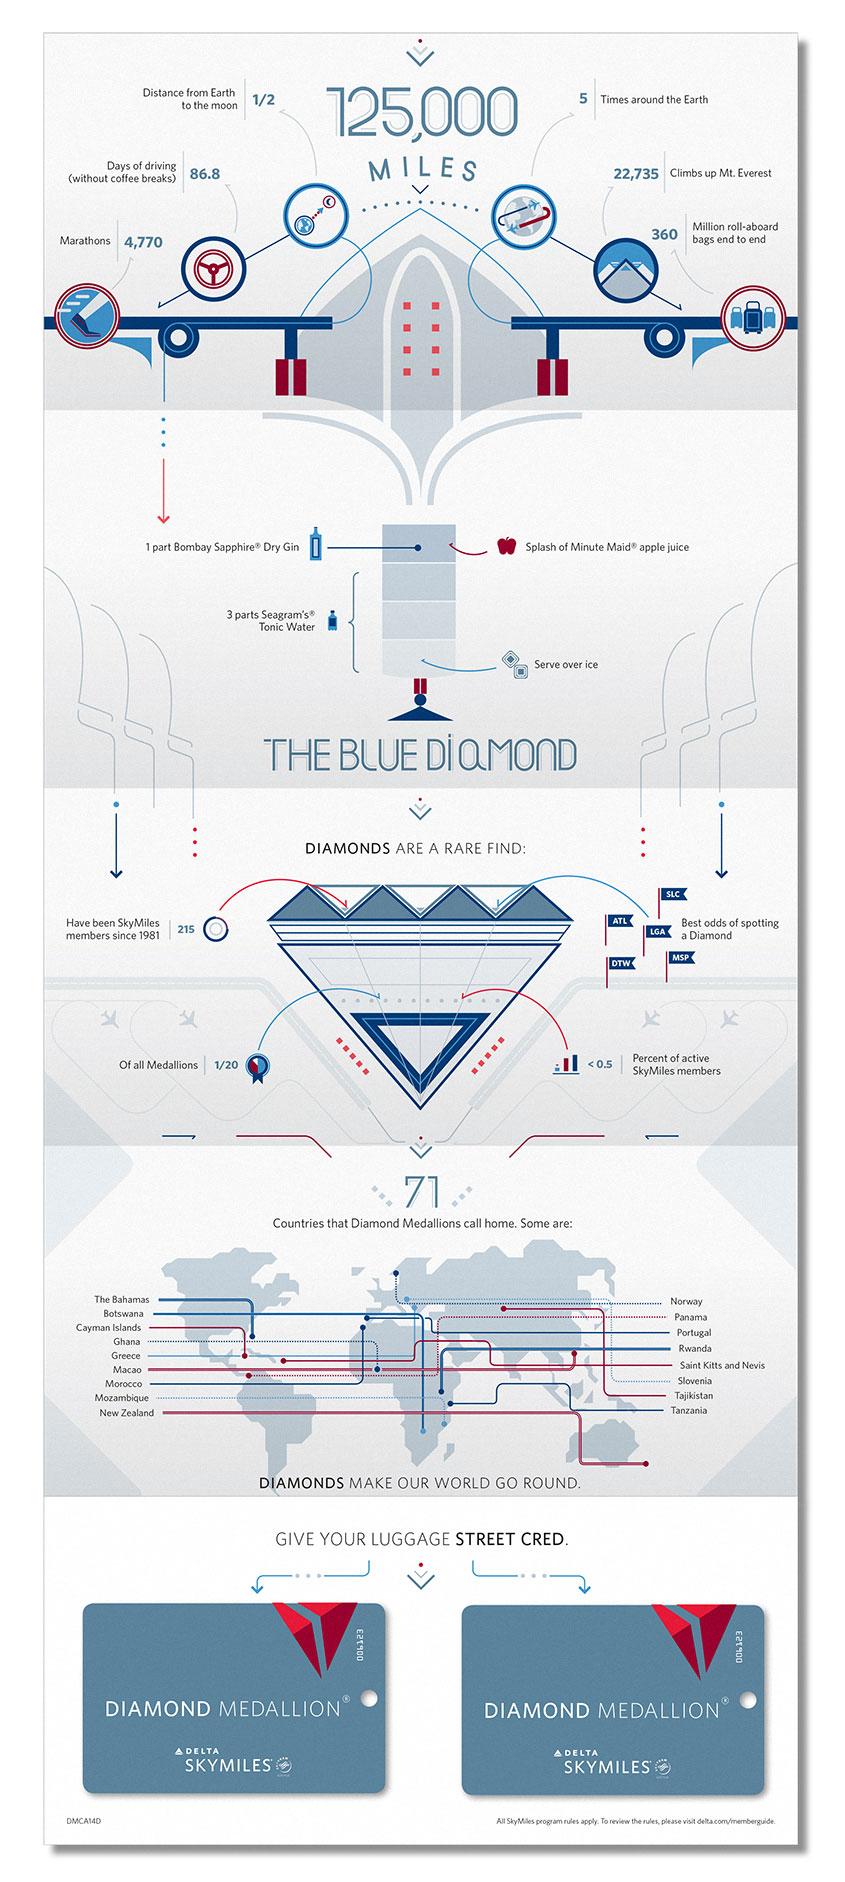 leandro-castelao-Brochures_Diamond_905.jpg